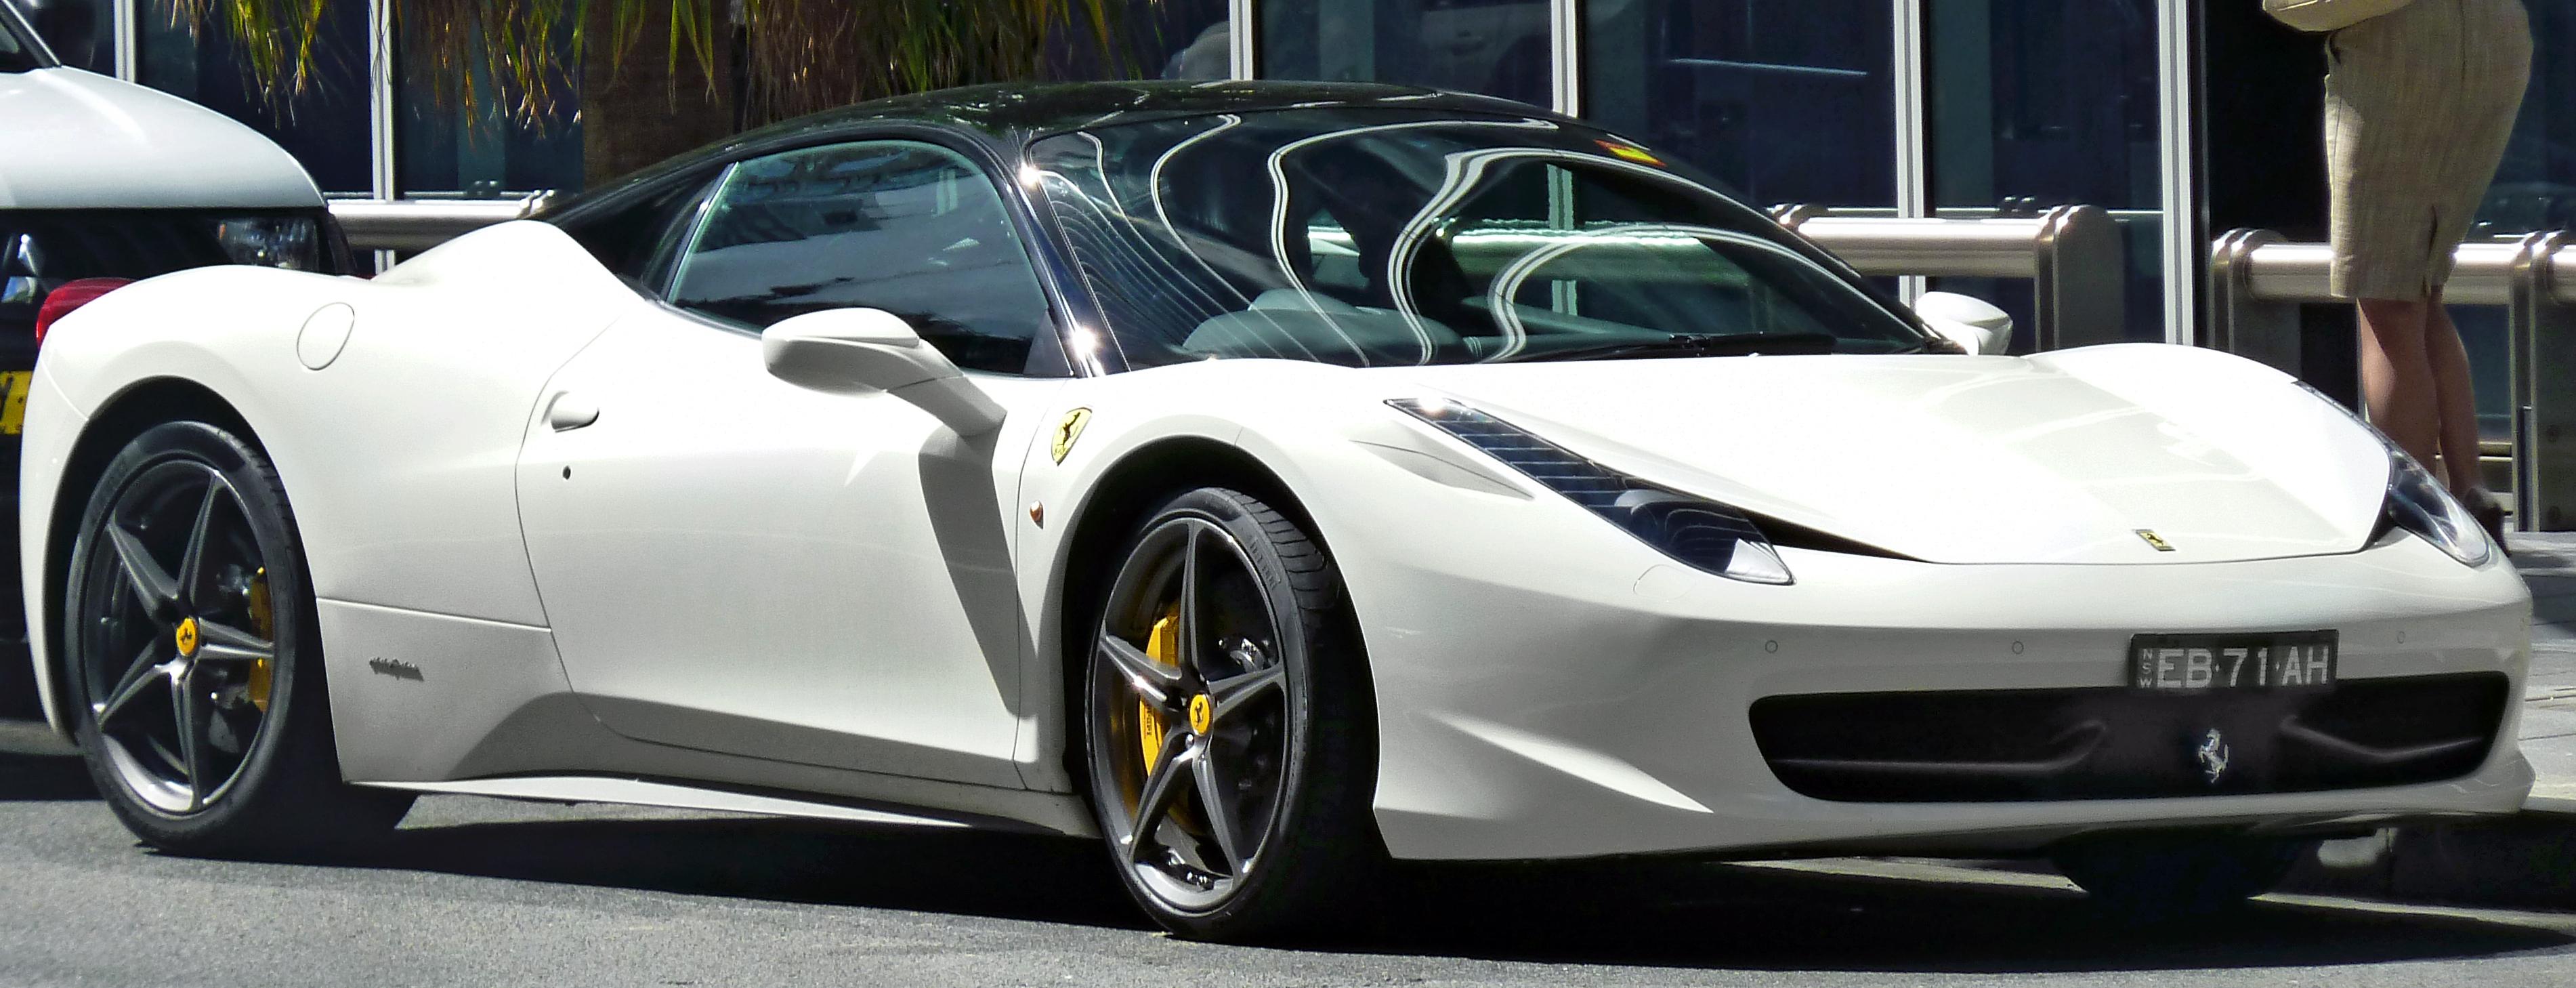 Ferrari 458 Italia 11 High Quality Ferrari 458 Italia